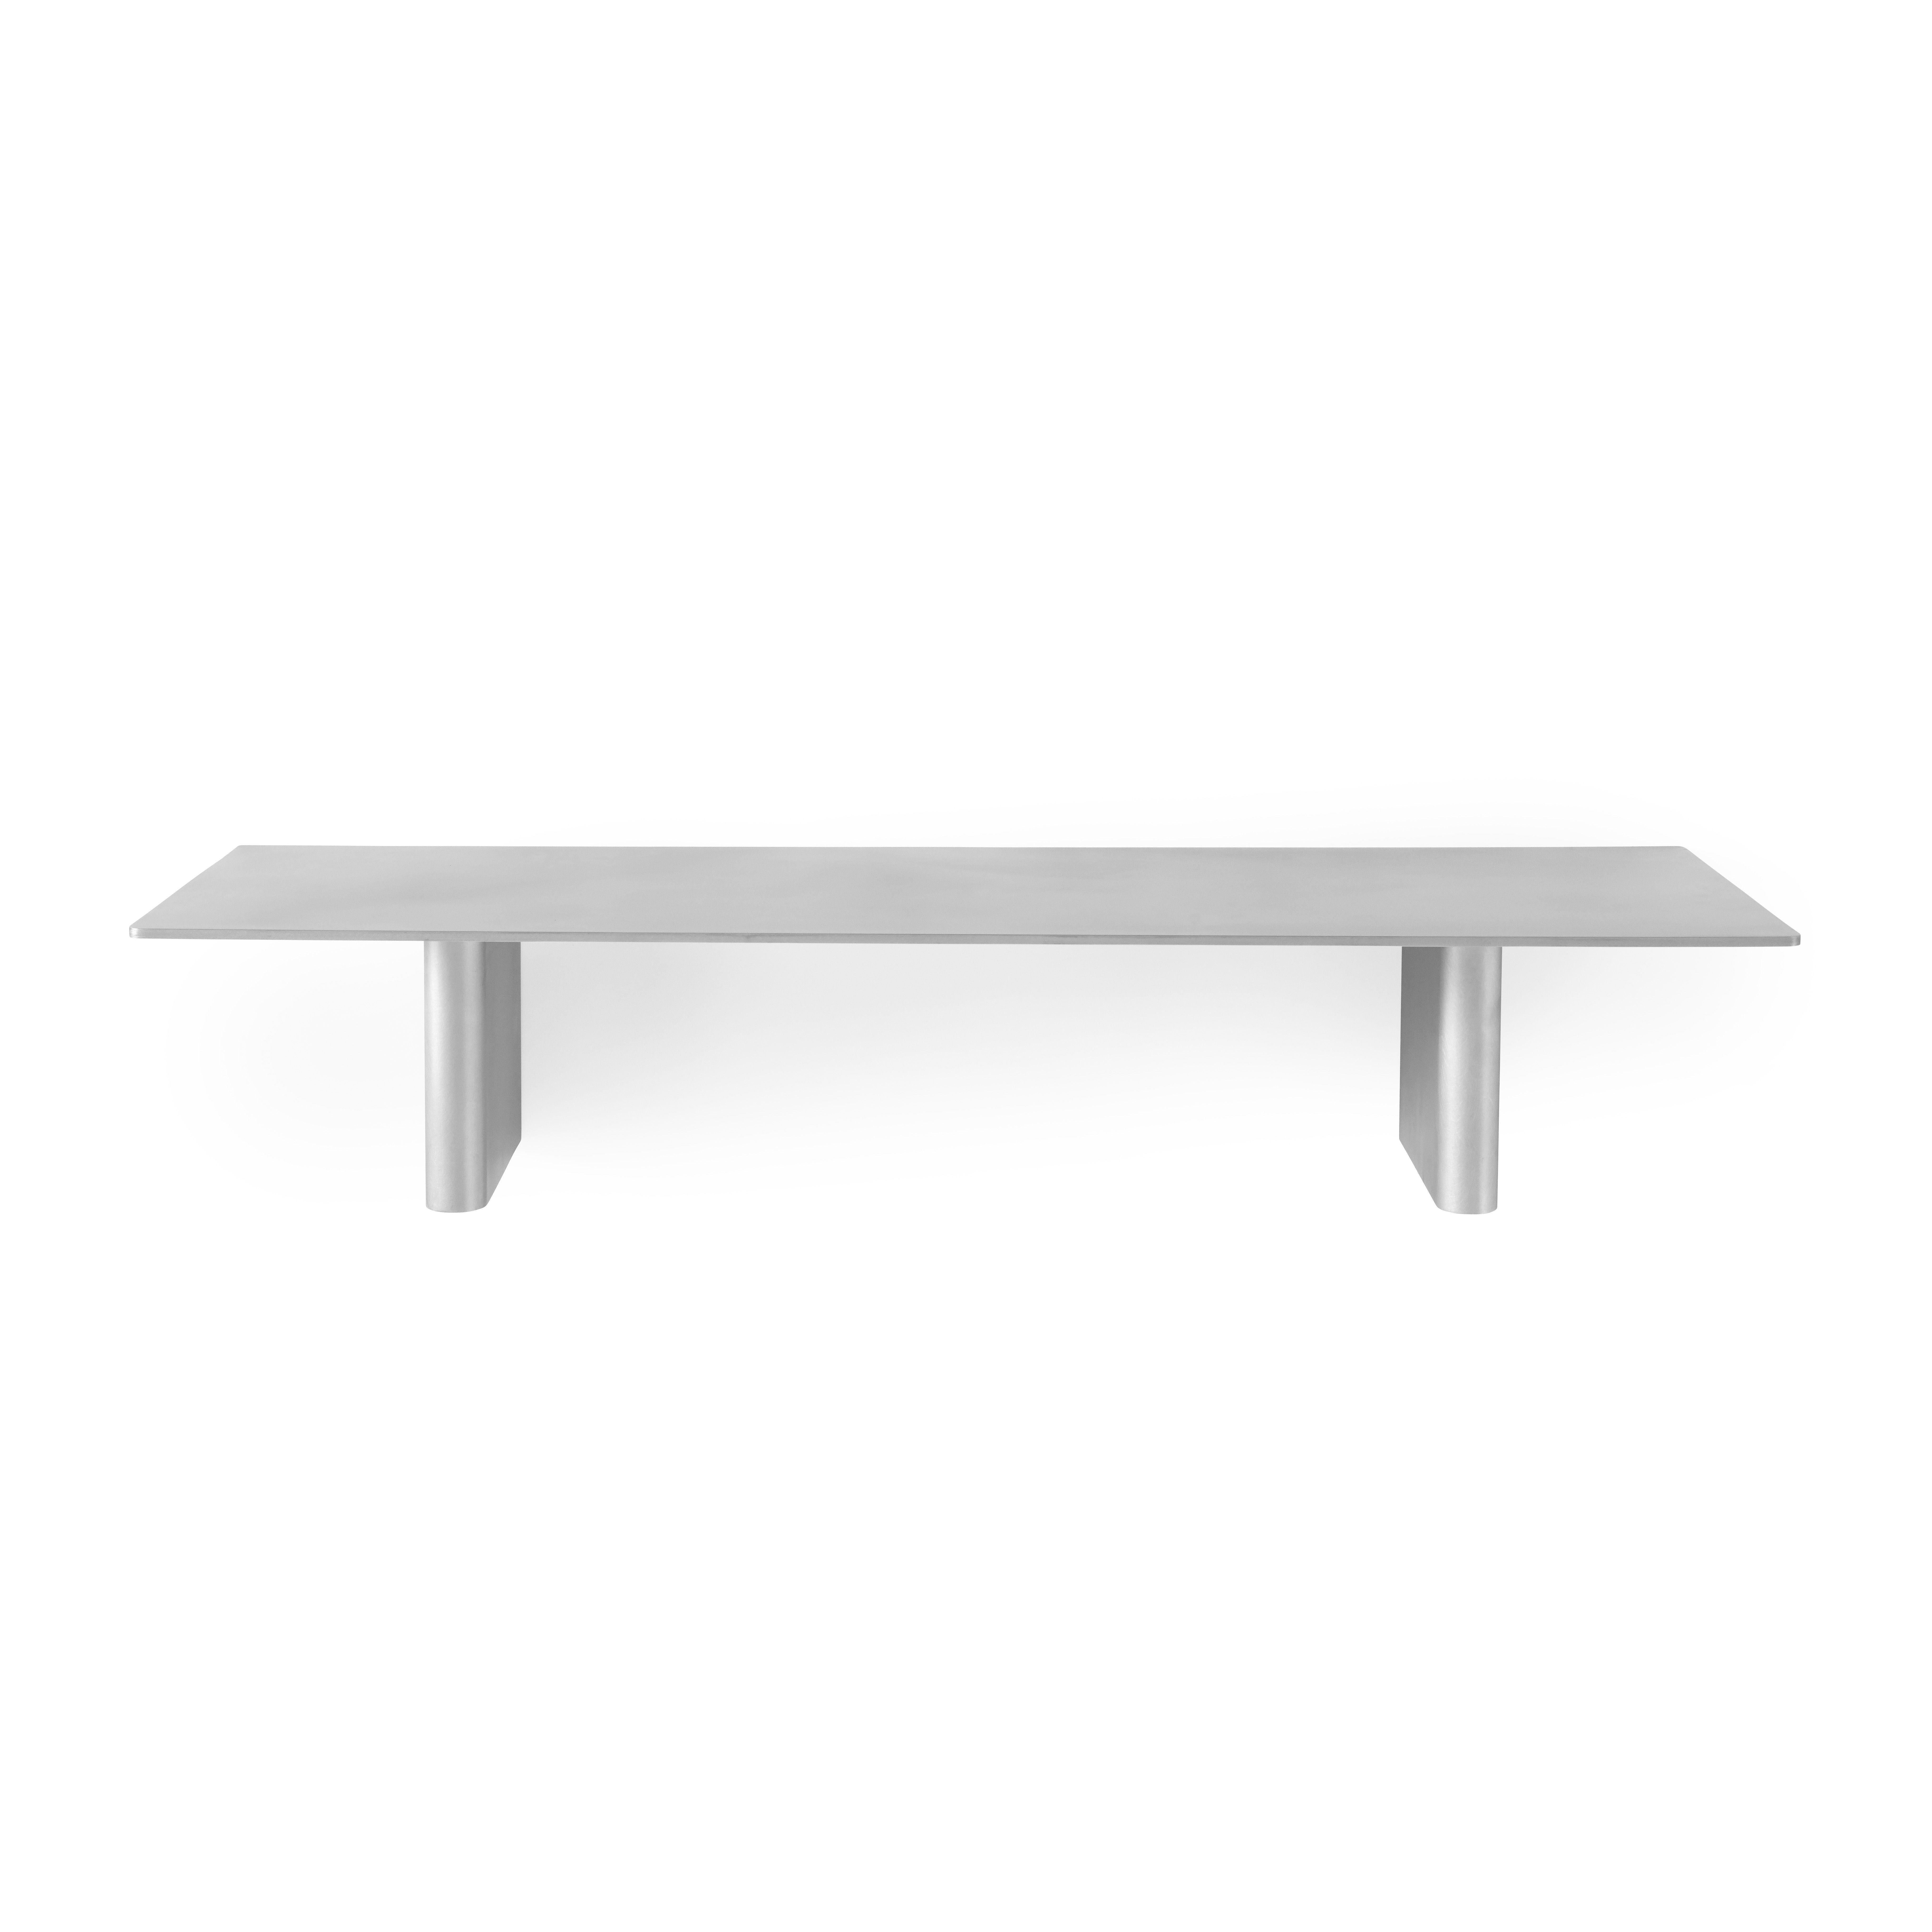 Mobilier - Etagères & bibliothèques - Etagère Column JA2 / Aluminium - L 80 cm - &tradition - Aluminium - Aluminium